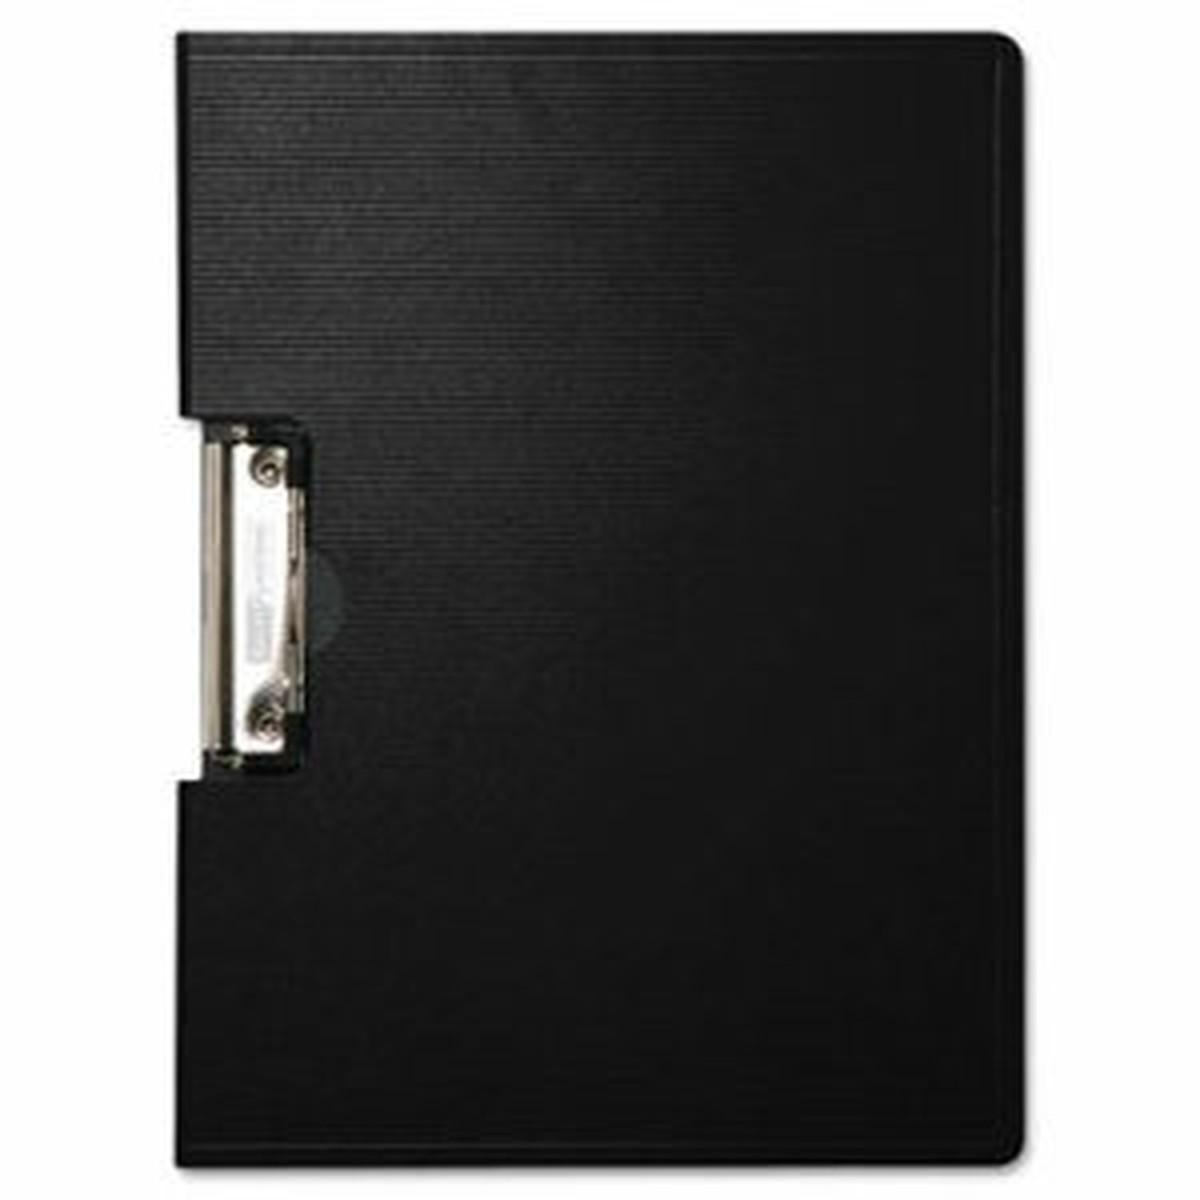 "Portfolio Clipboard With Low-Profile Clip, 1/2"" Capacity, 11 x 8 1/2, Black"